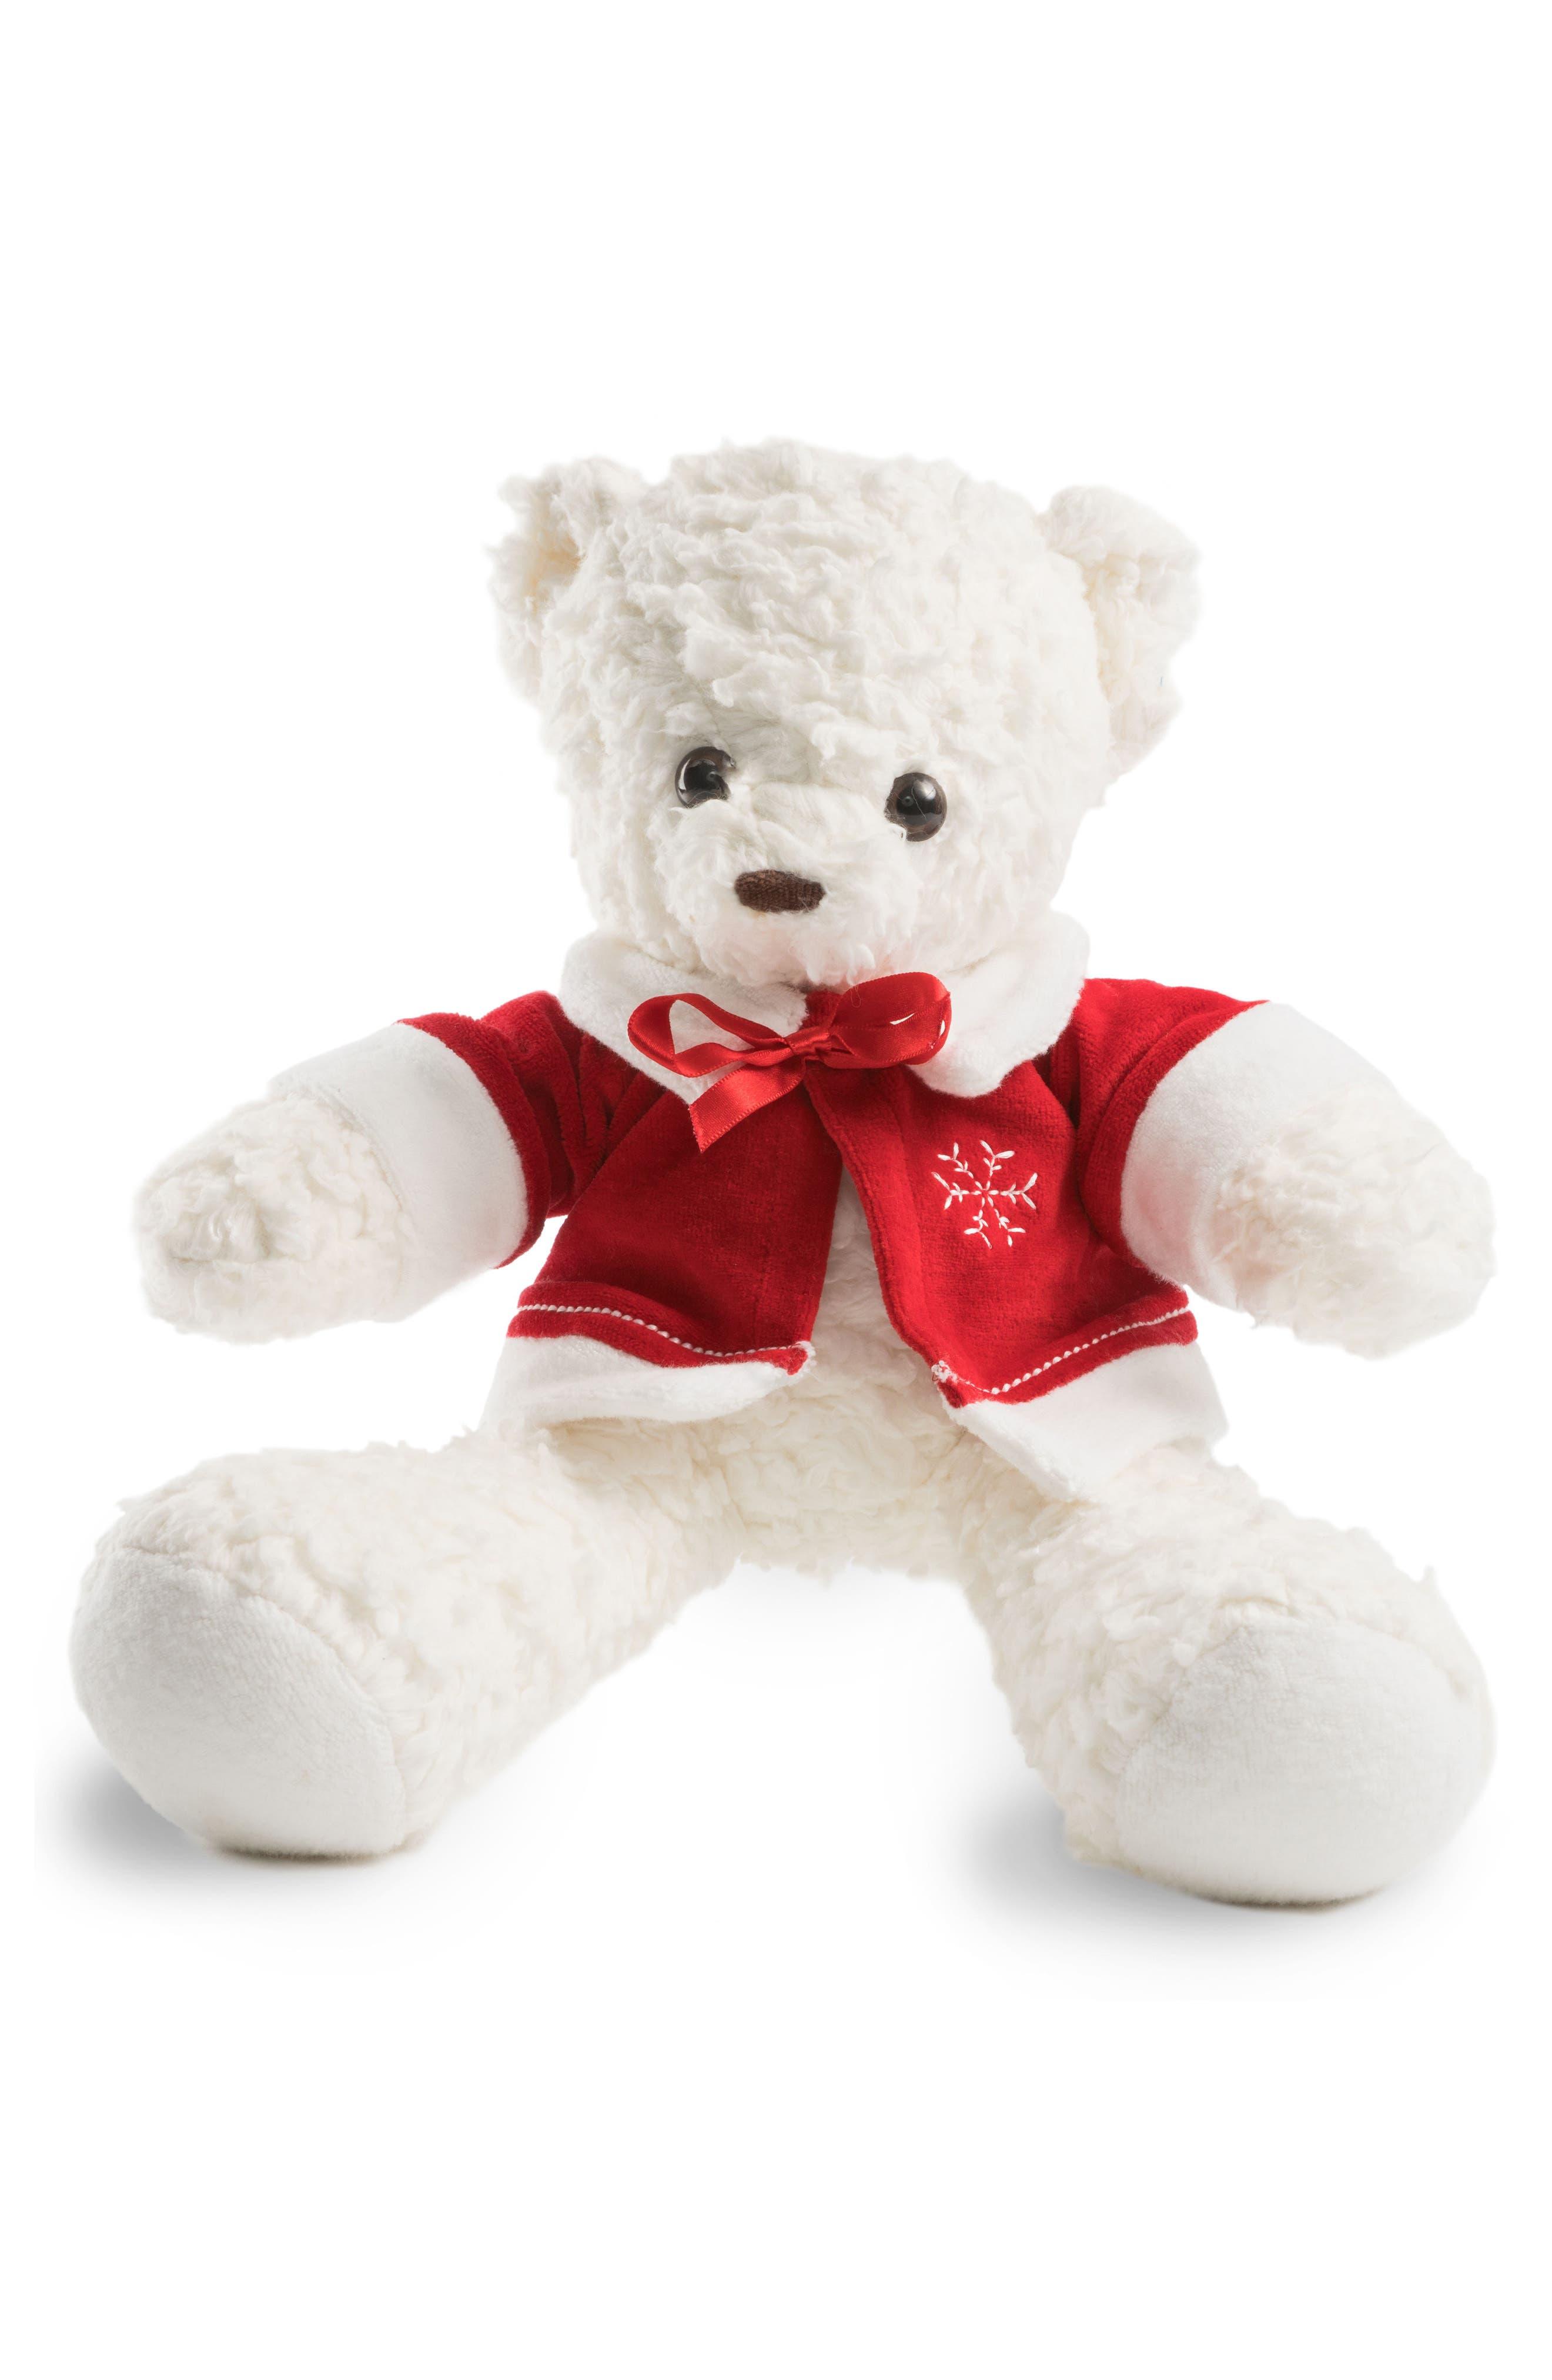 Medium Stuffed Bear with Holiday Jacket,                             Main thumbnail 1, color,                             White